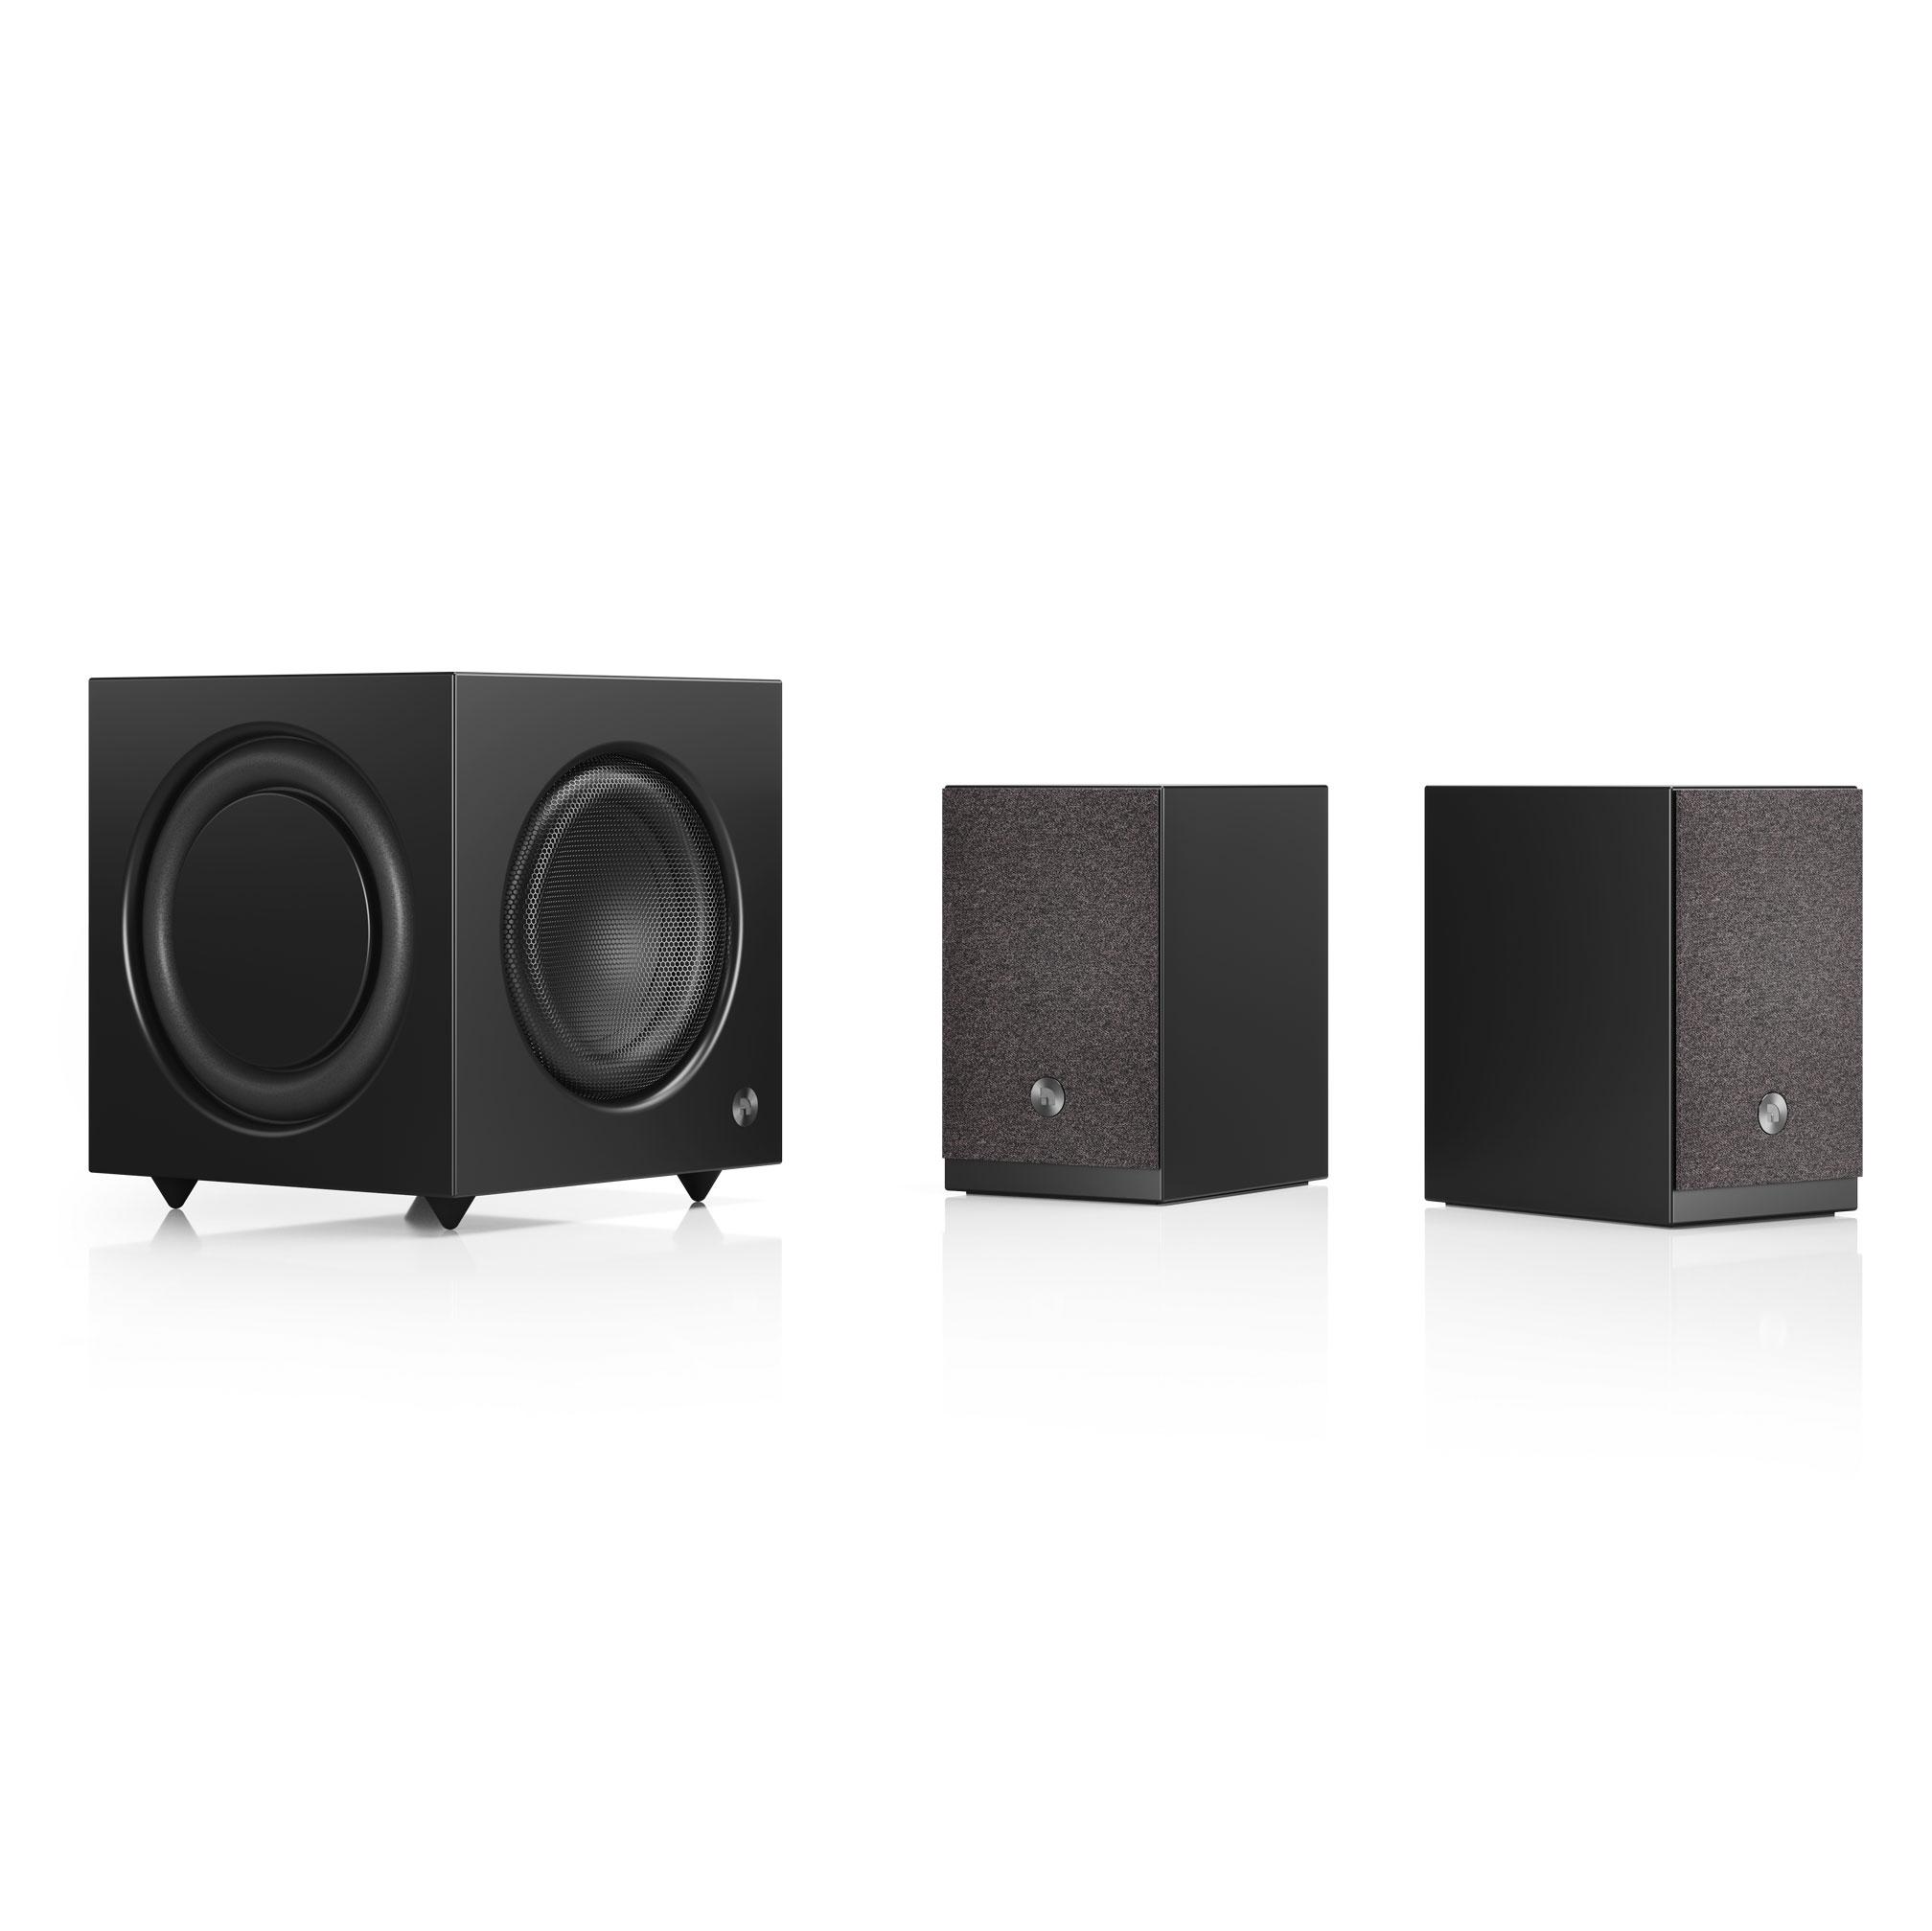 Active Subwoofer Sw 10 Wireless Multiroom Speaker A26 Black Group1 Audiopro Audio Pro